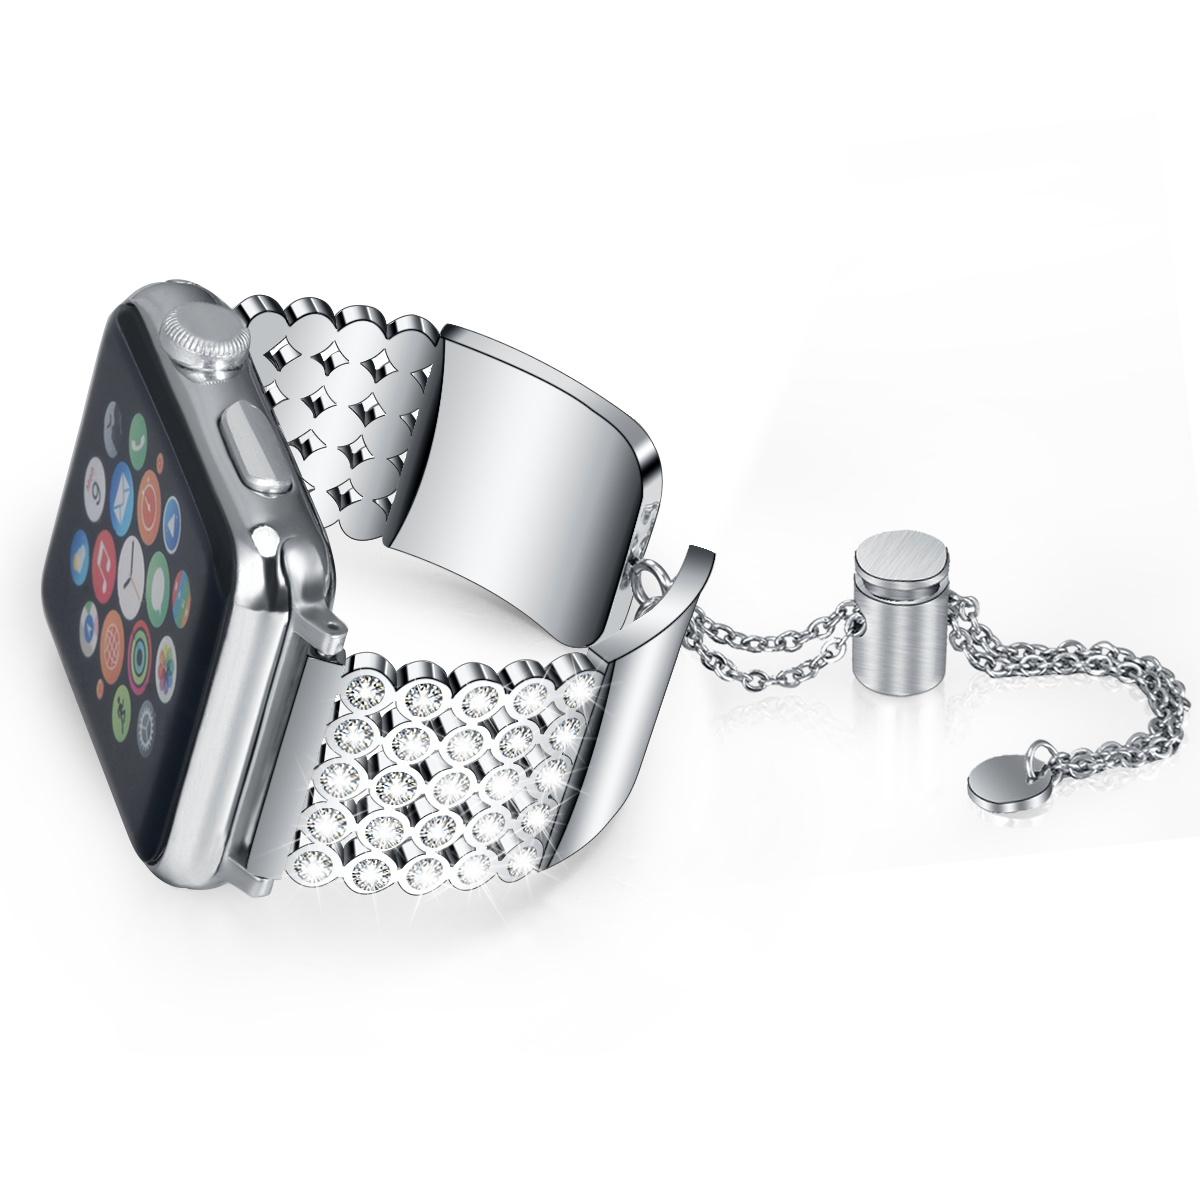 ... Tajima Analog Watch Date 3099 Leather Date Jam Tangan Kulit Pria Source China Stainless Steel Bracelet